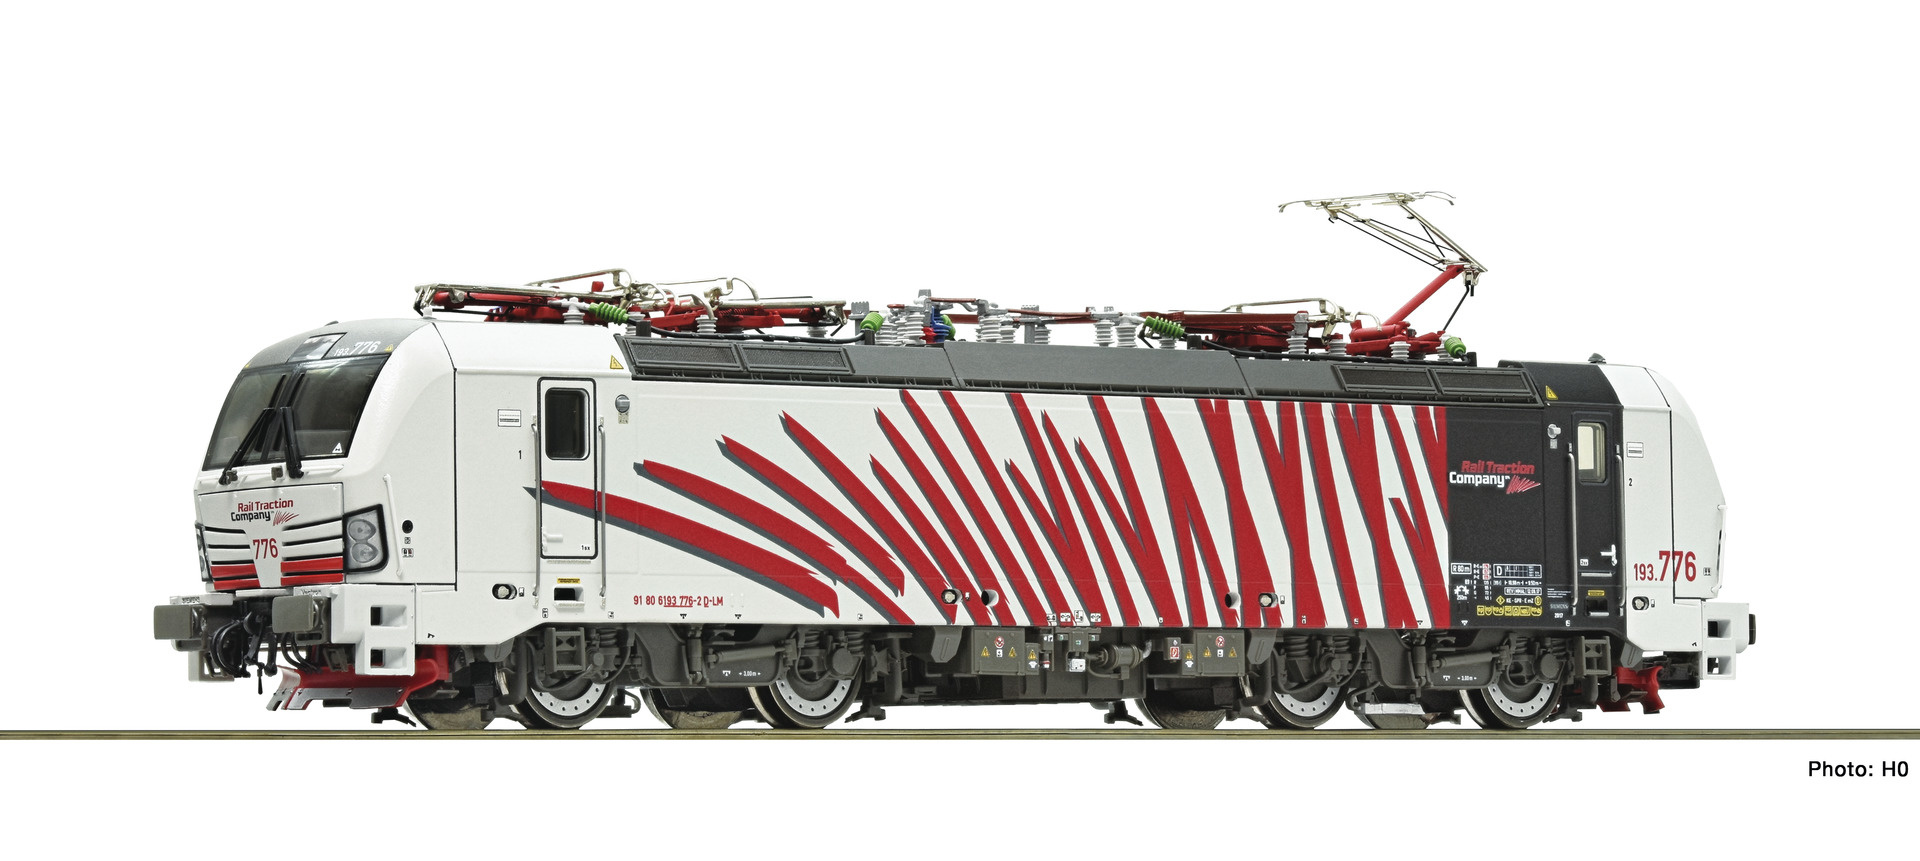 739354 E-Lok 193 776-2 Lomo Leo SND.-1